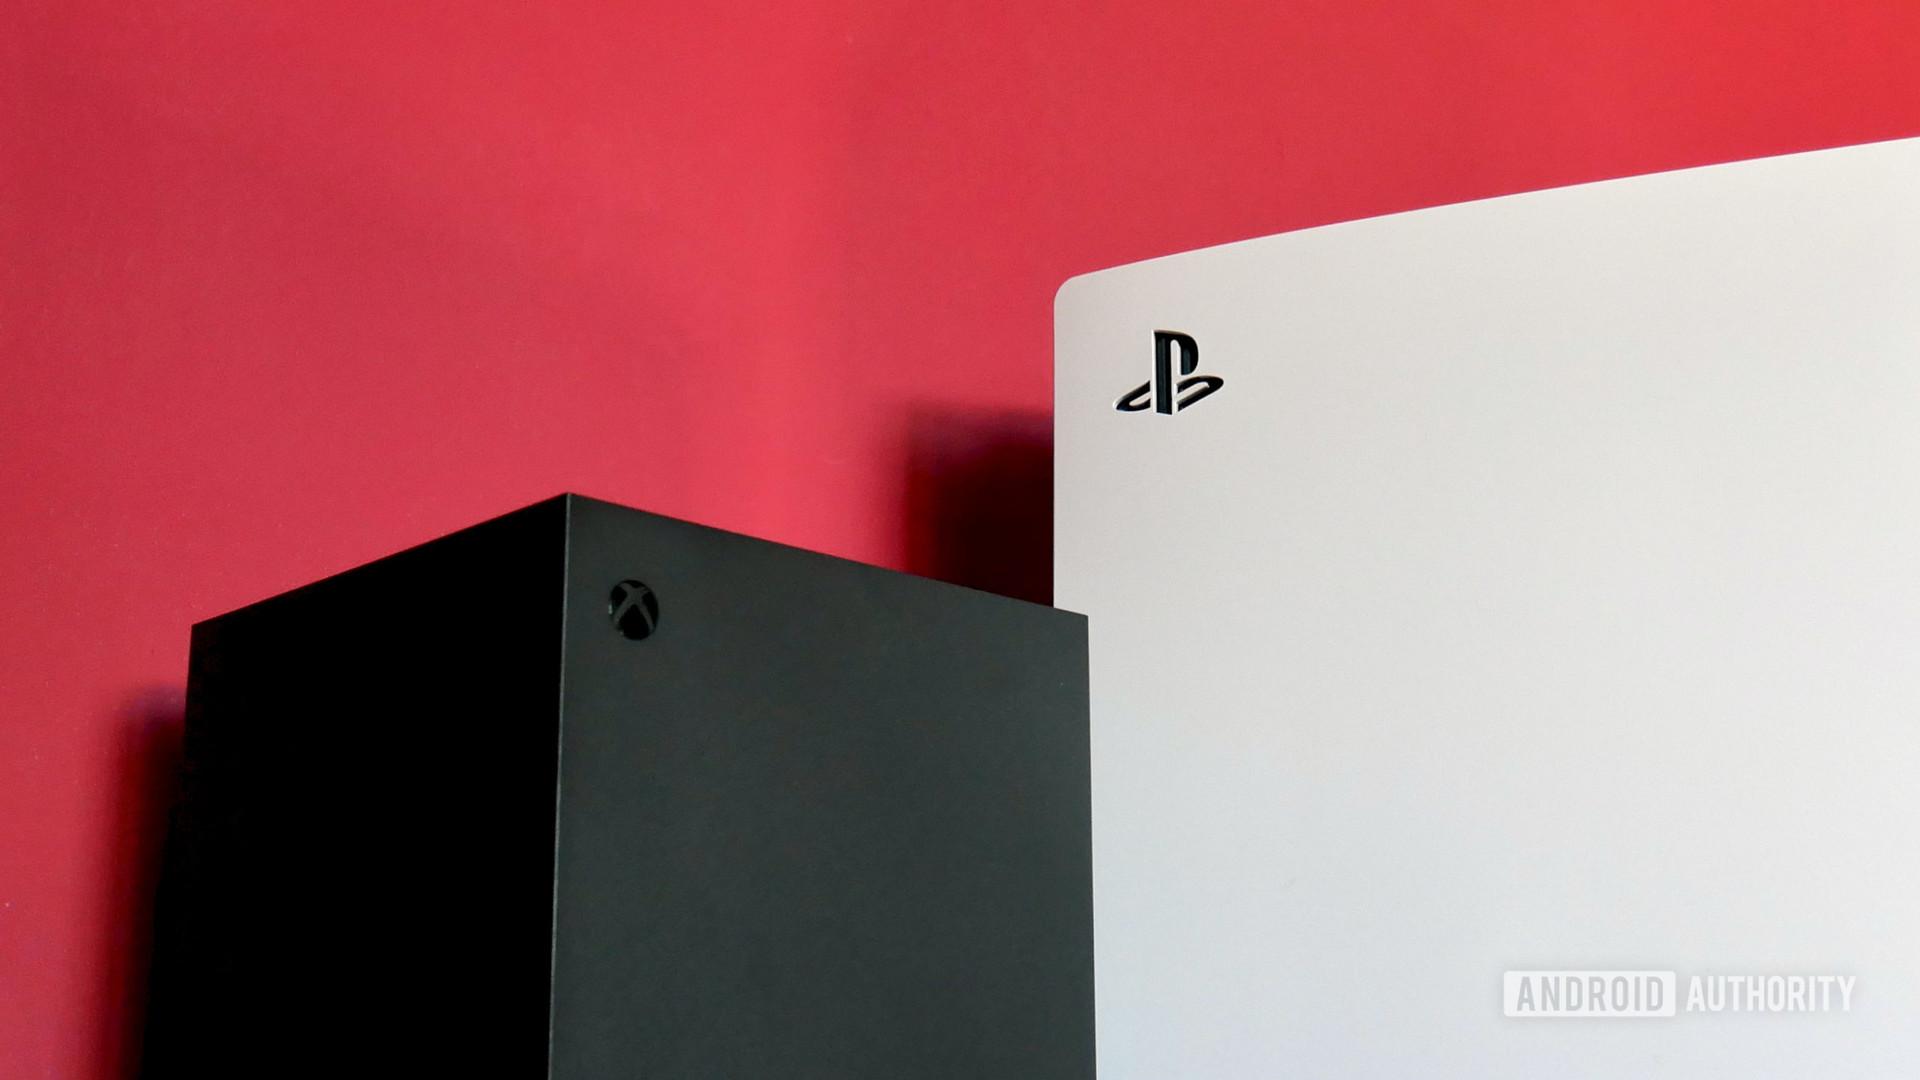 ps5 vs xbox series x logo 2